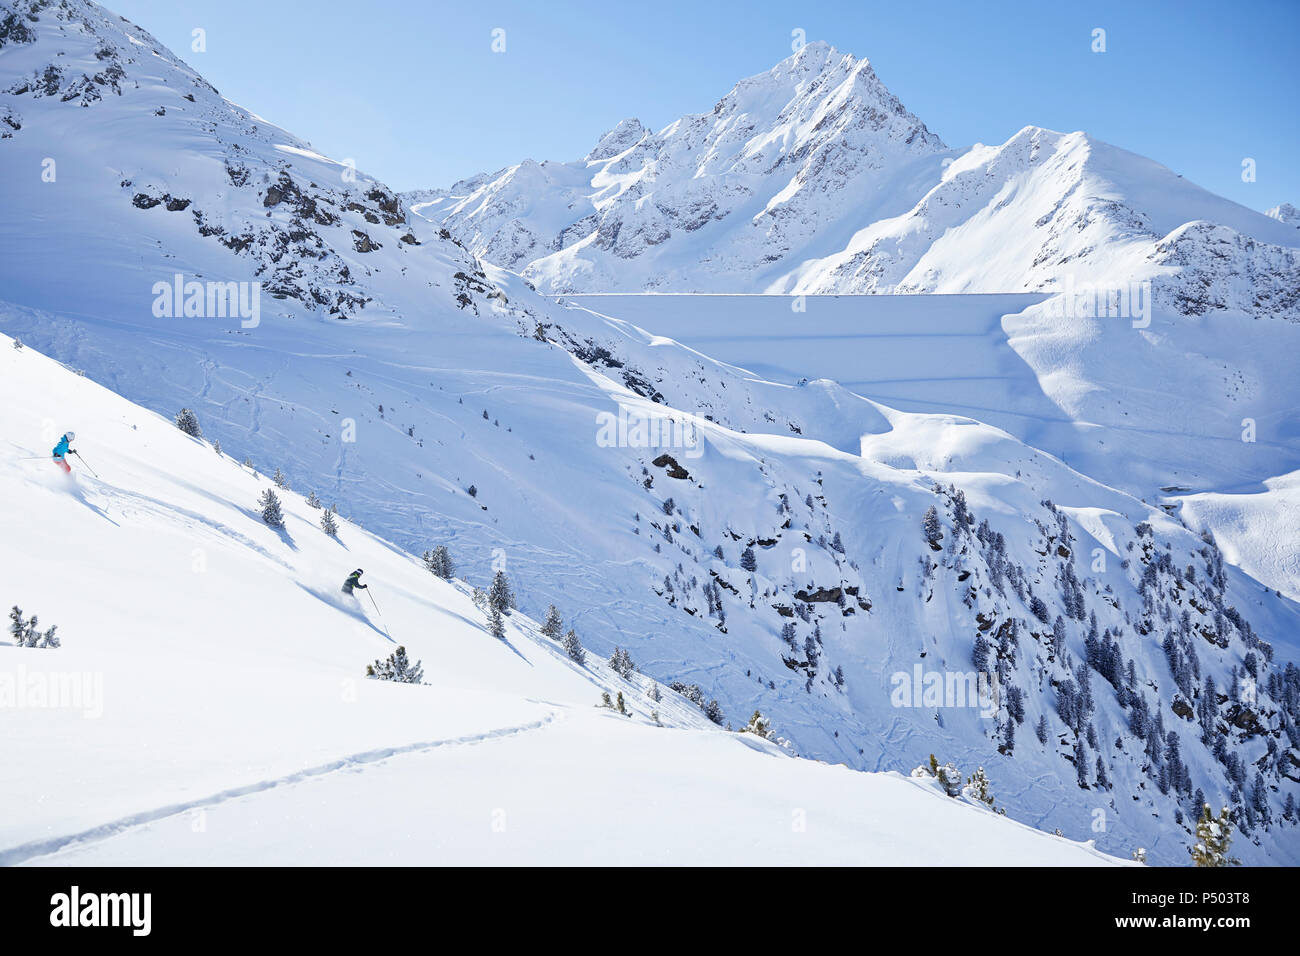 Austria, Tyrol, Kuehtai, couple skiing in winter landscape - Stock Image